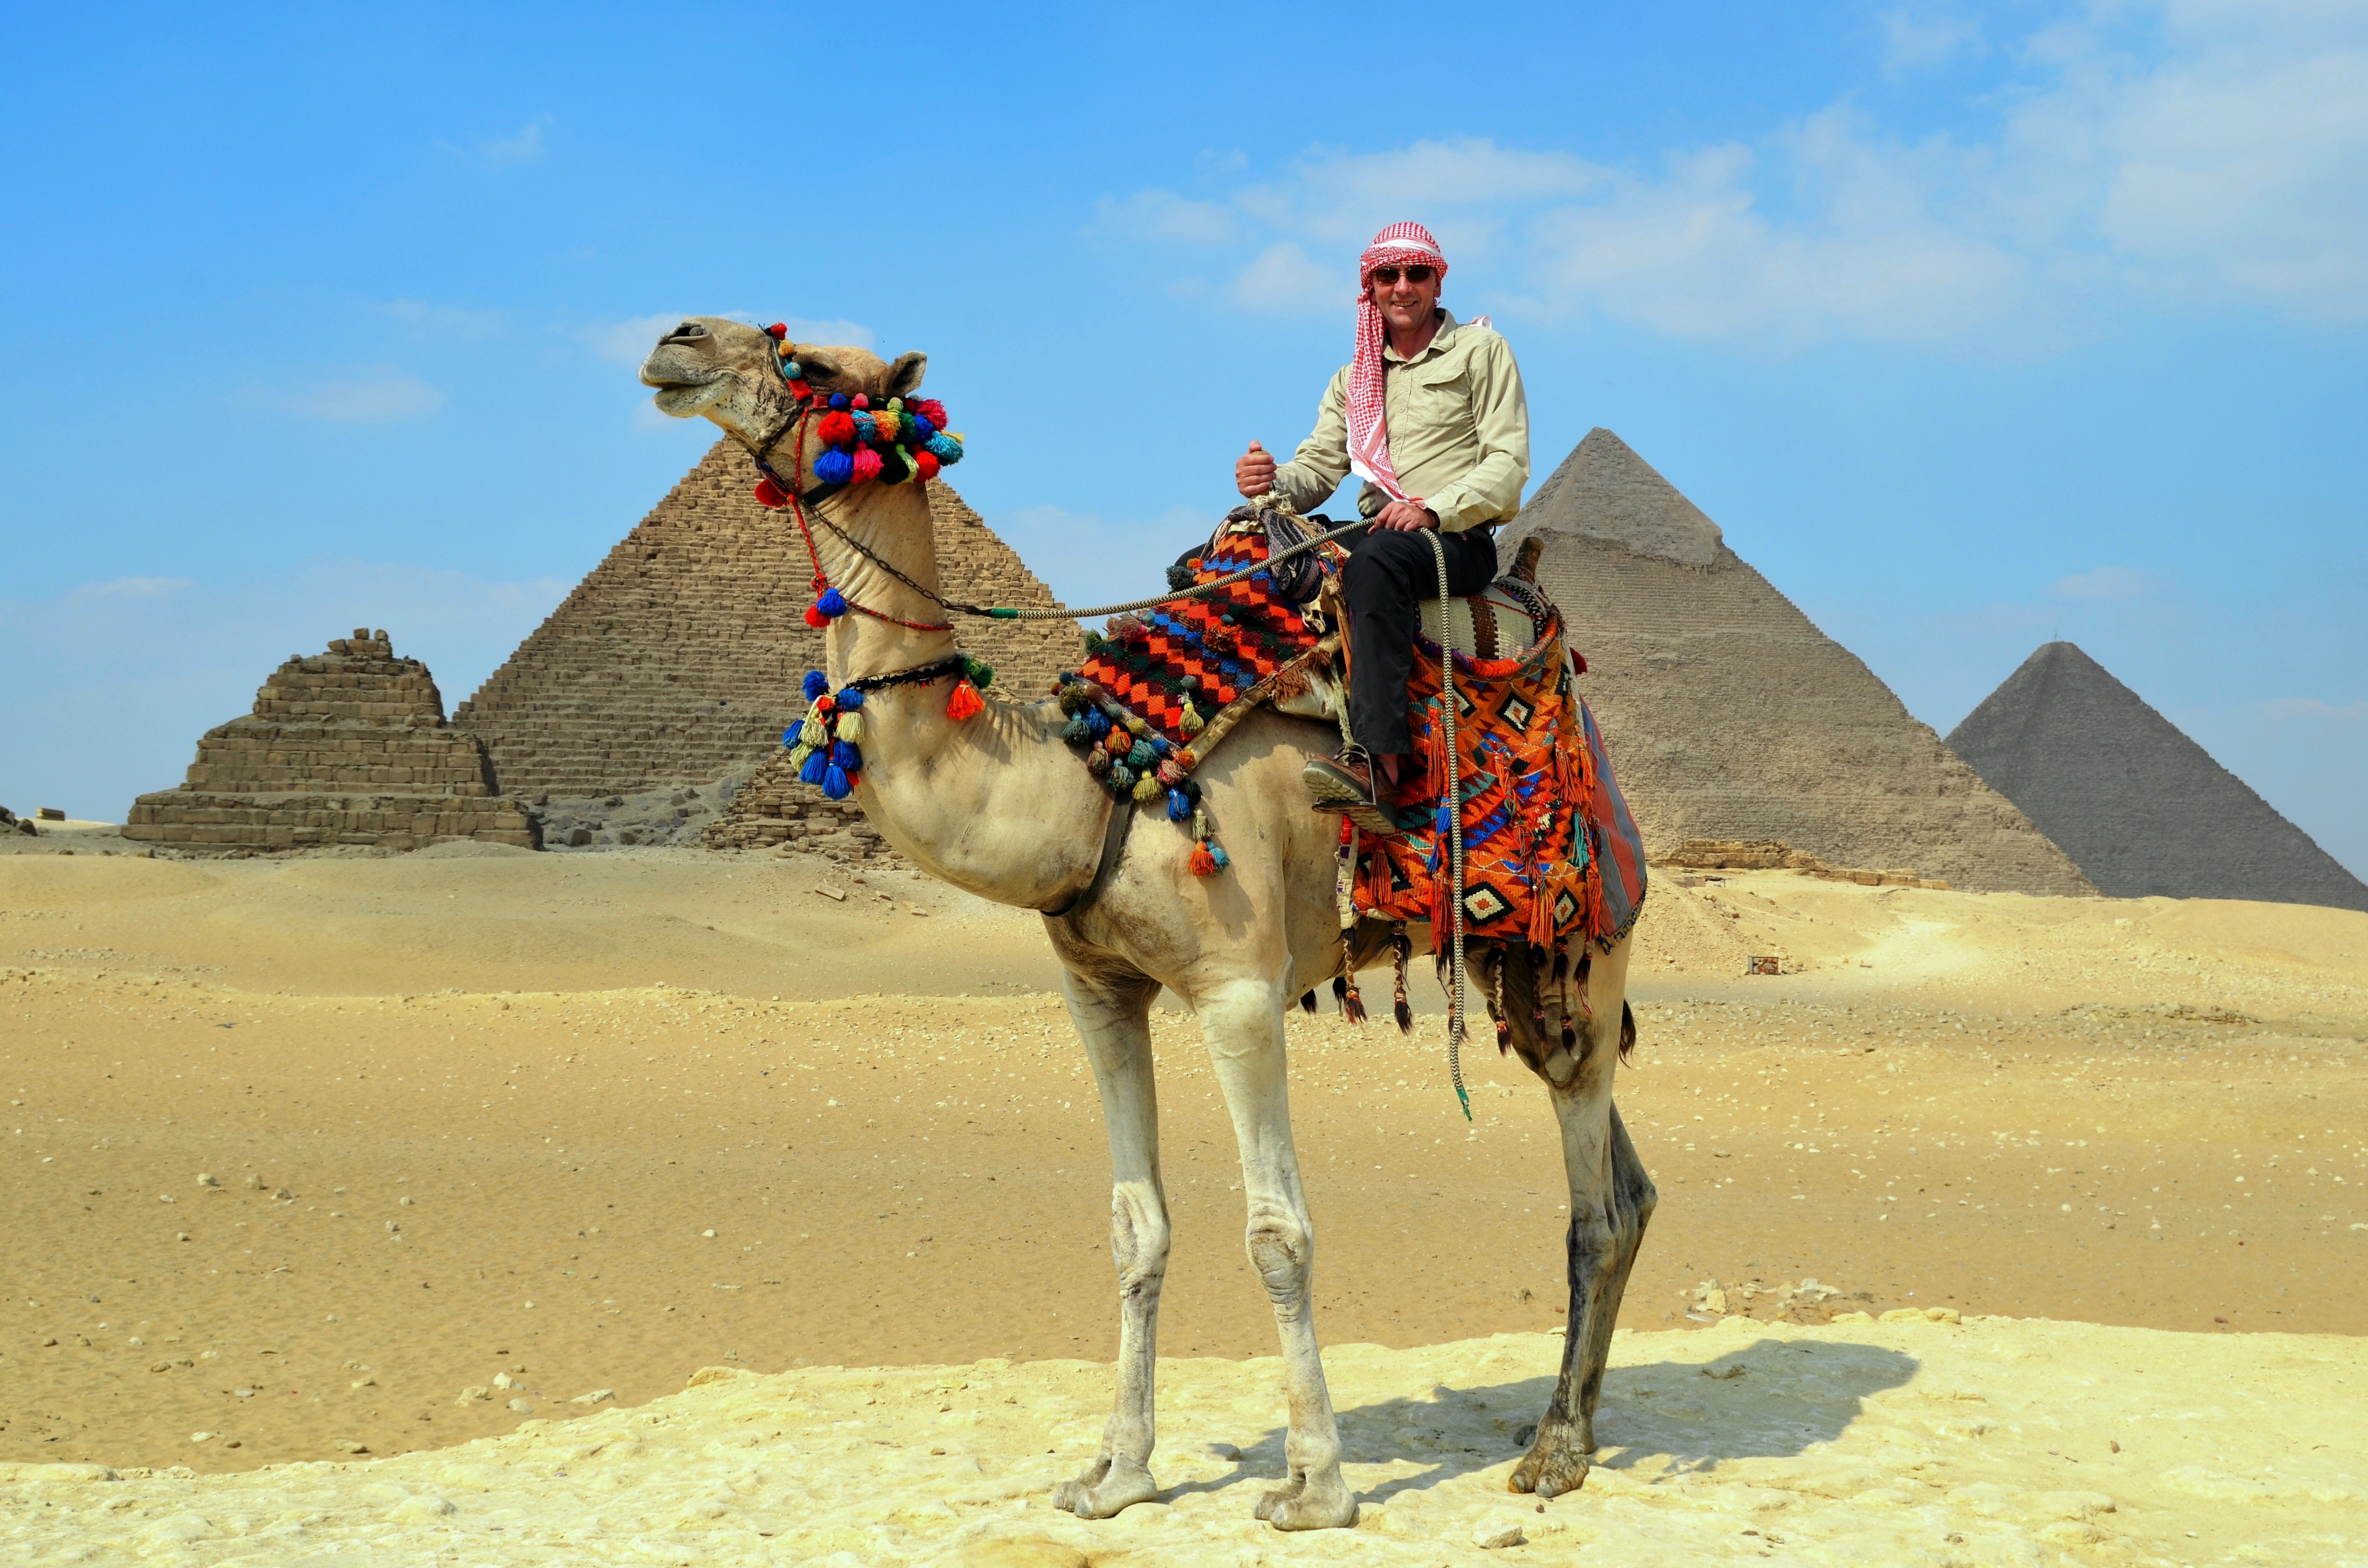 DSC_0161 Pyramids Cairo